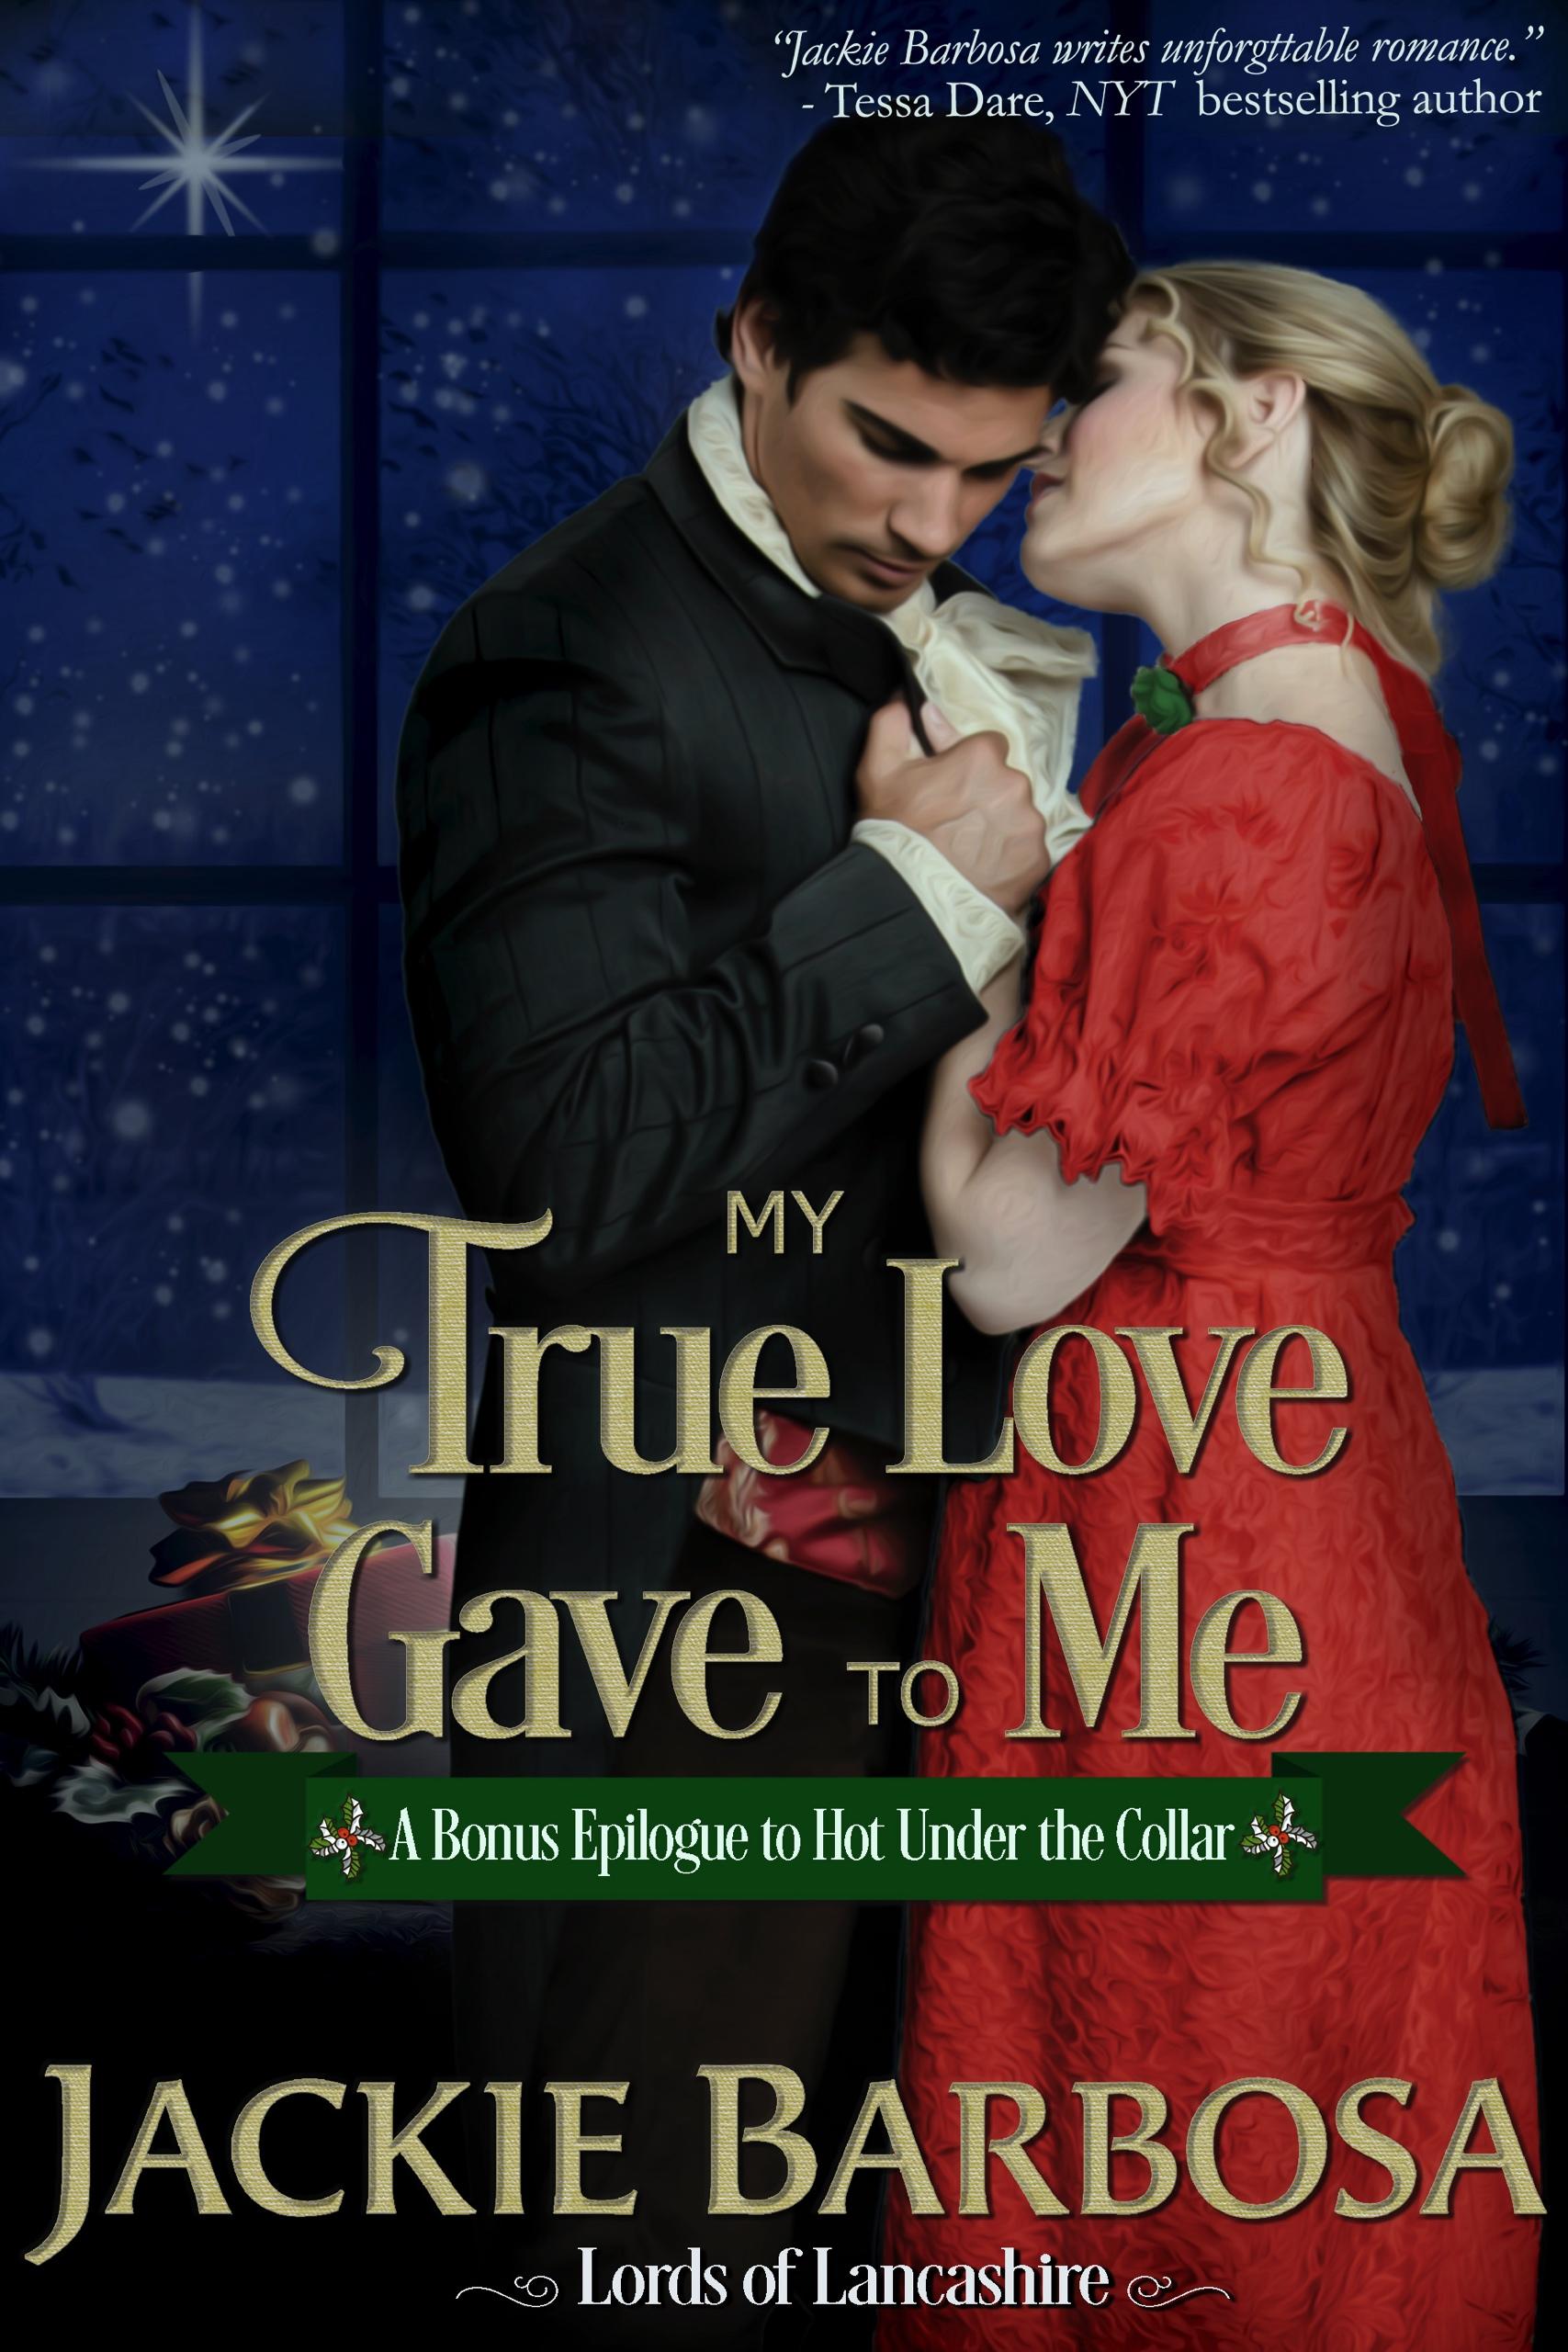 My True Love Gave to Me by Jackie Barbosa